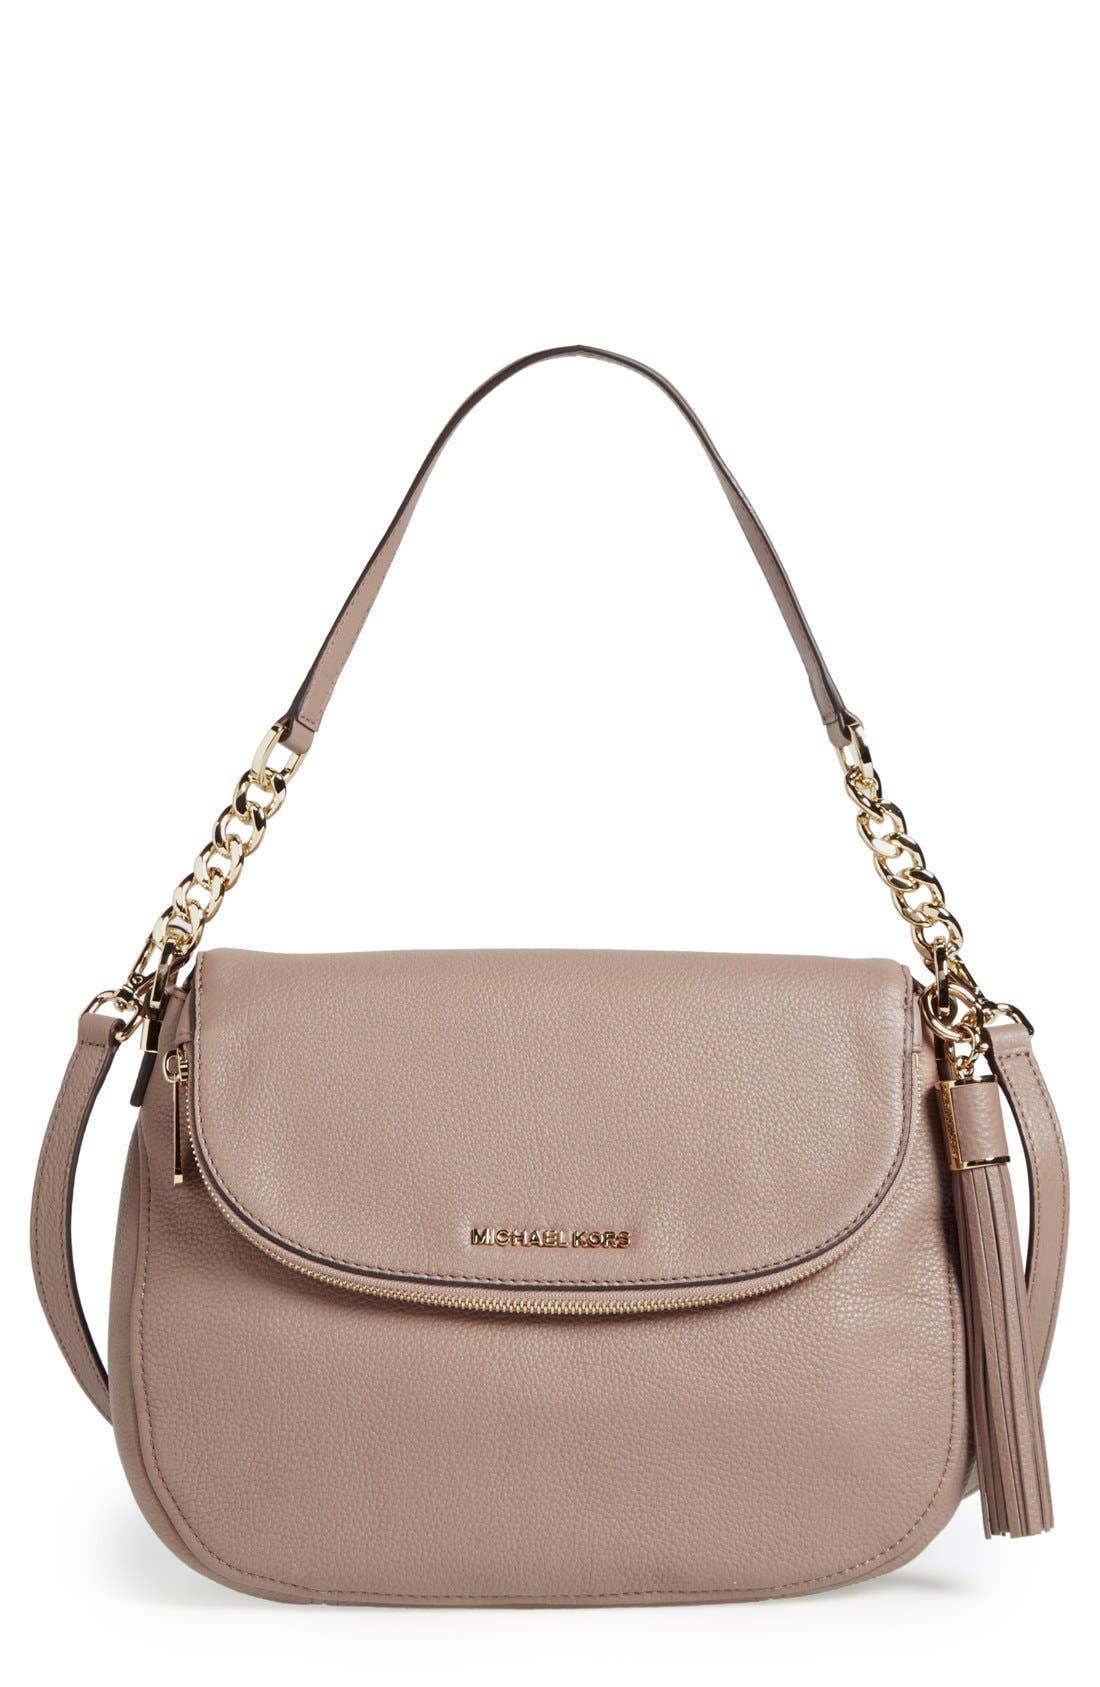 Alternate Image 1 Selected - MICHAEL Michael Kors 'Bedford Tassel - Medium' Convertible Leather Shoulder Bag (Nordstrom Exclusive)